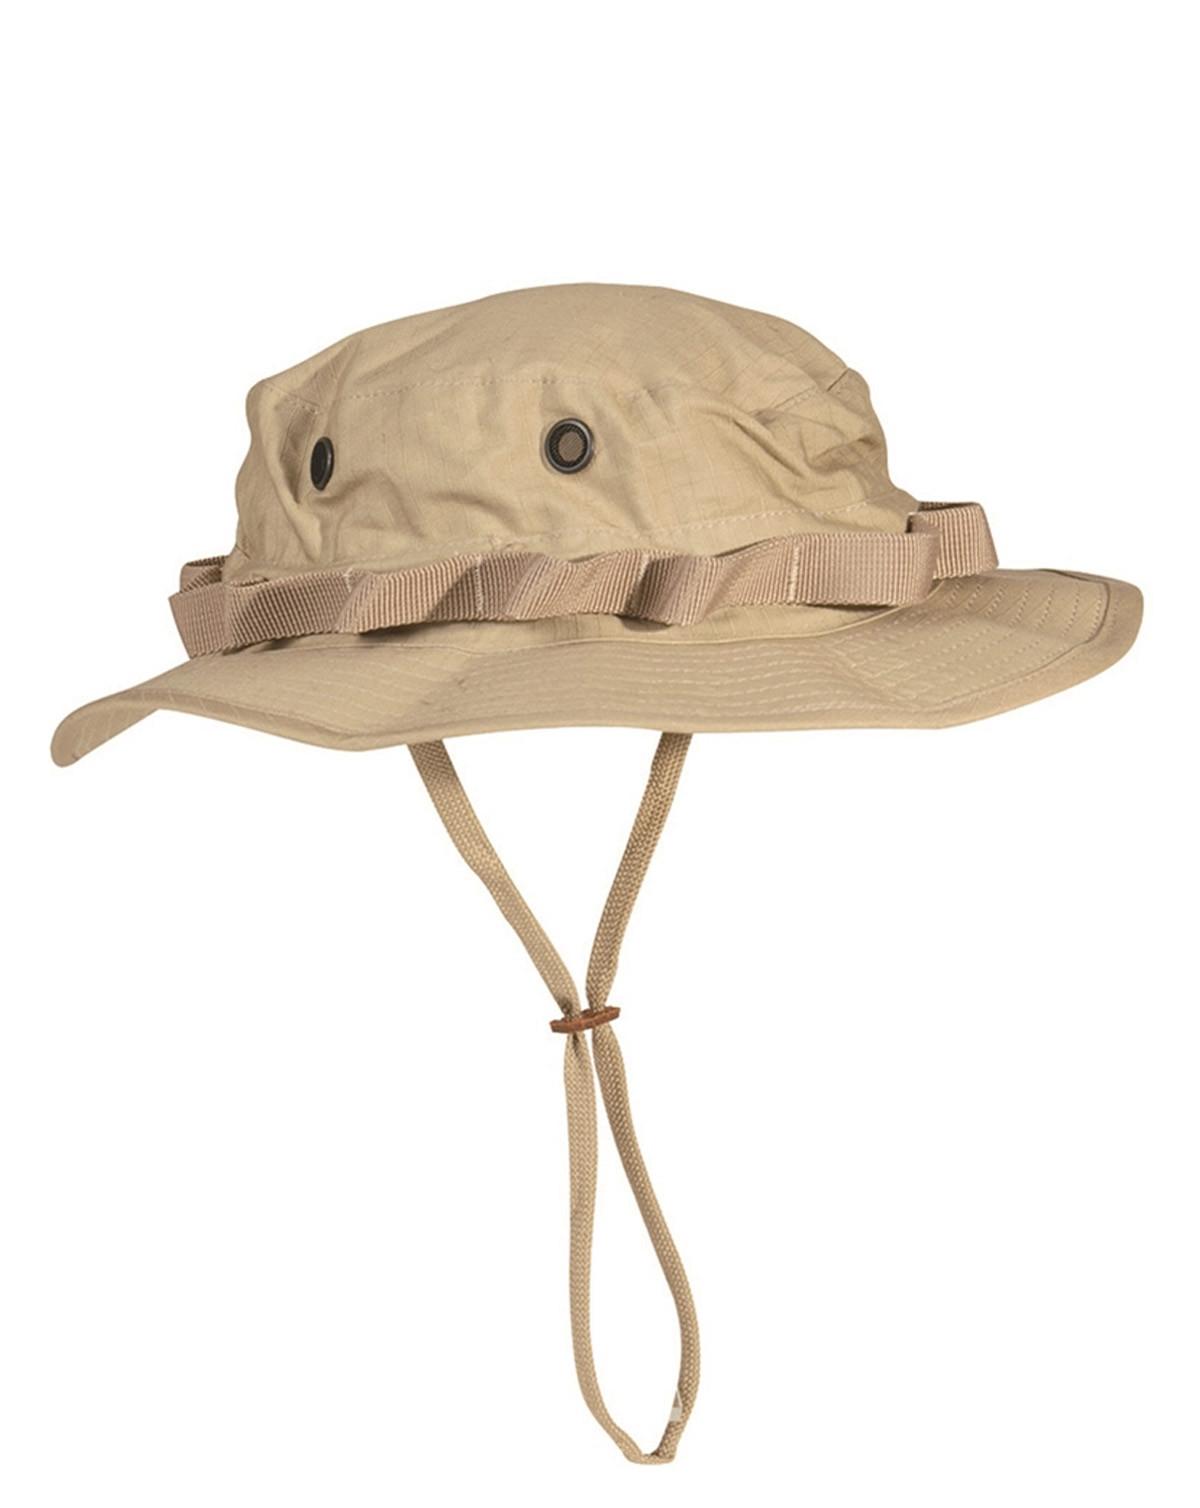 Mil-Tec GI Boonie Hatt (Khaki, XL)